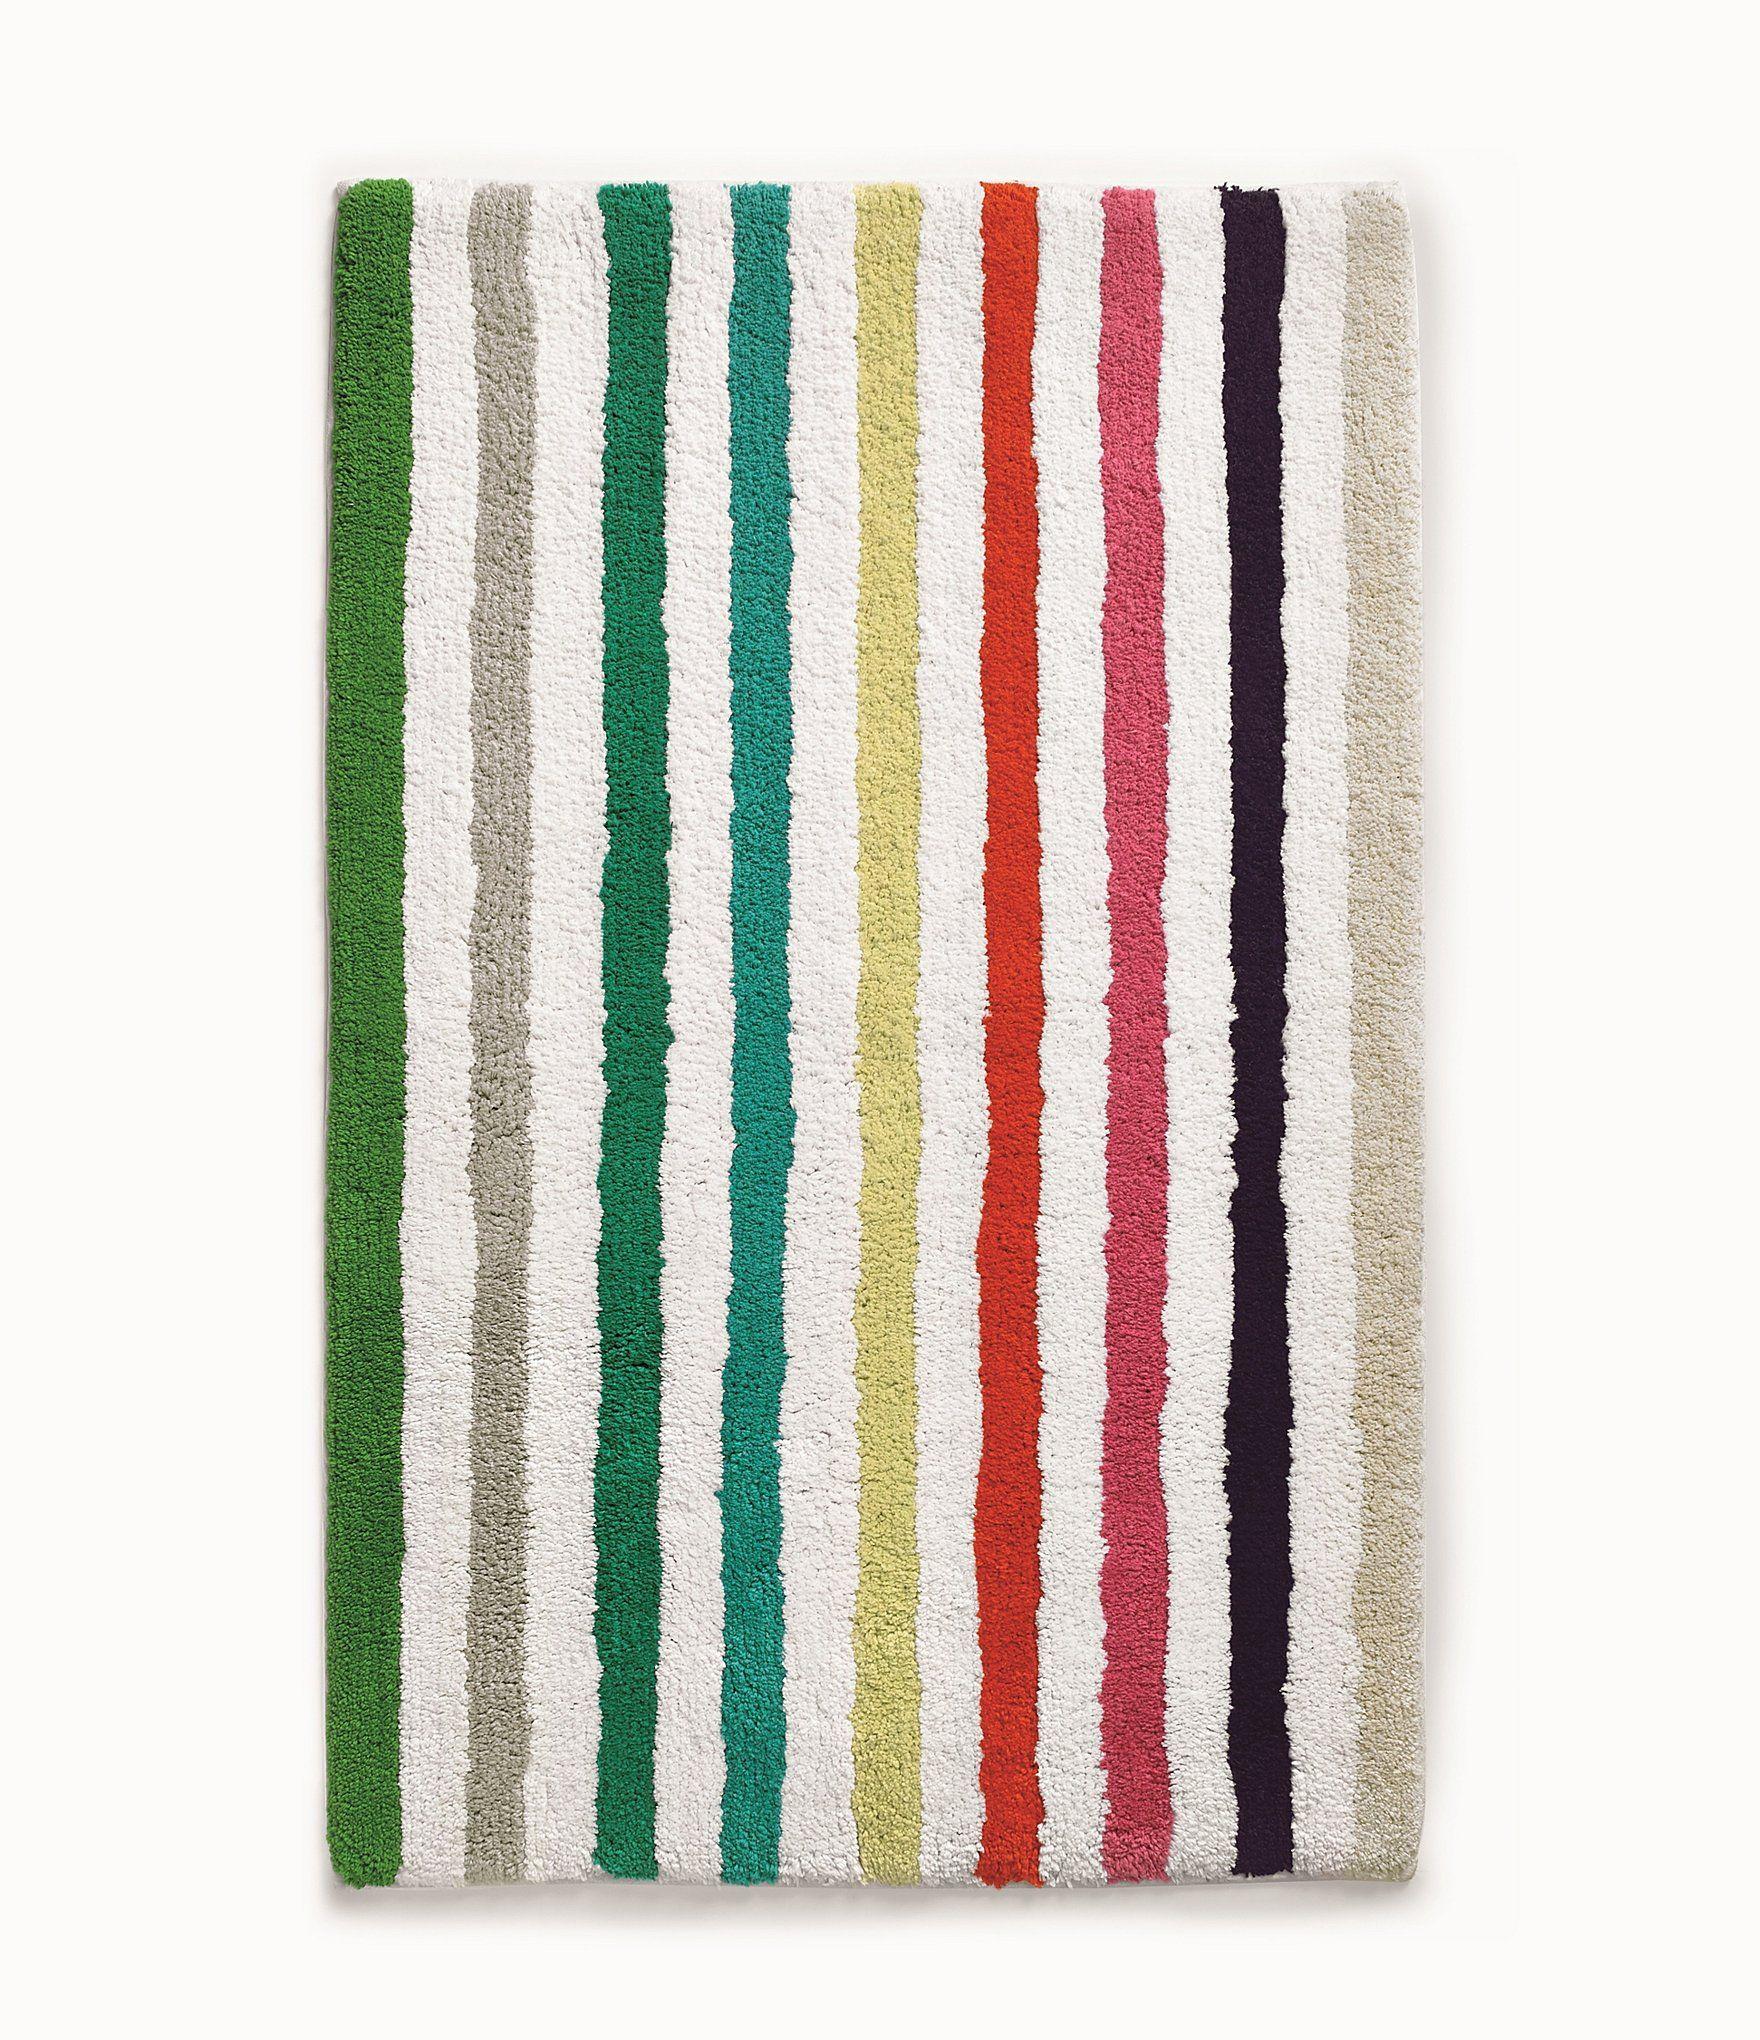 Shop For Kate Spade New York Candy Stripe Bath Rug At Dillards Com Visit Dillards Com To Find Clothing Accessories Shoe Striped Bath Rug Bath Rug York Candy [ 2040 x 1760 Pixel ]